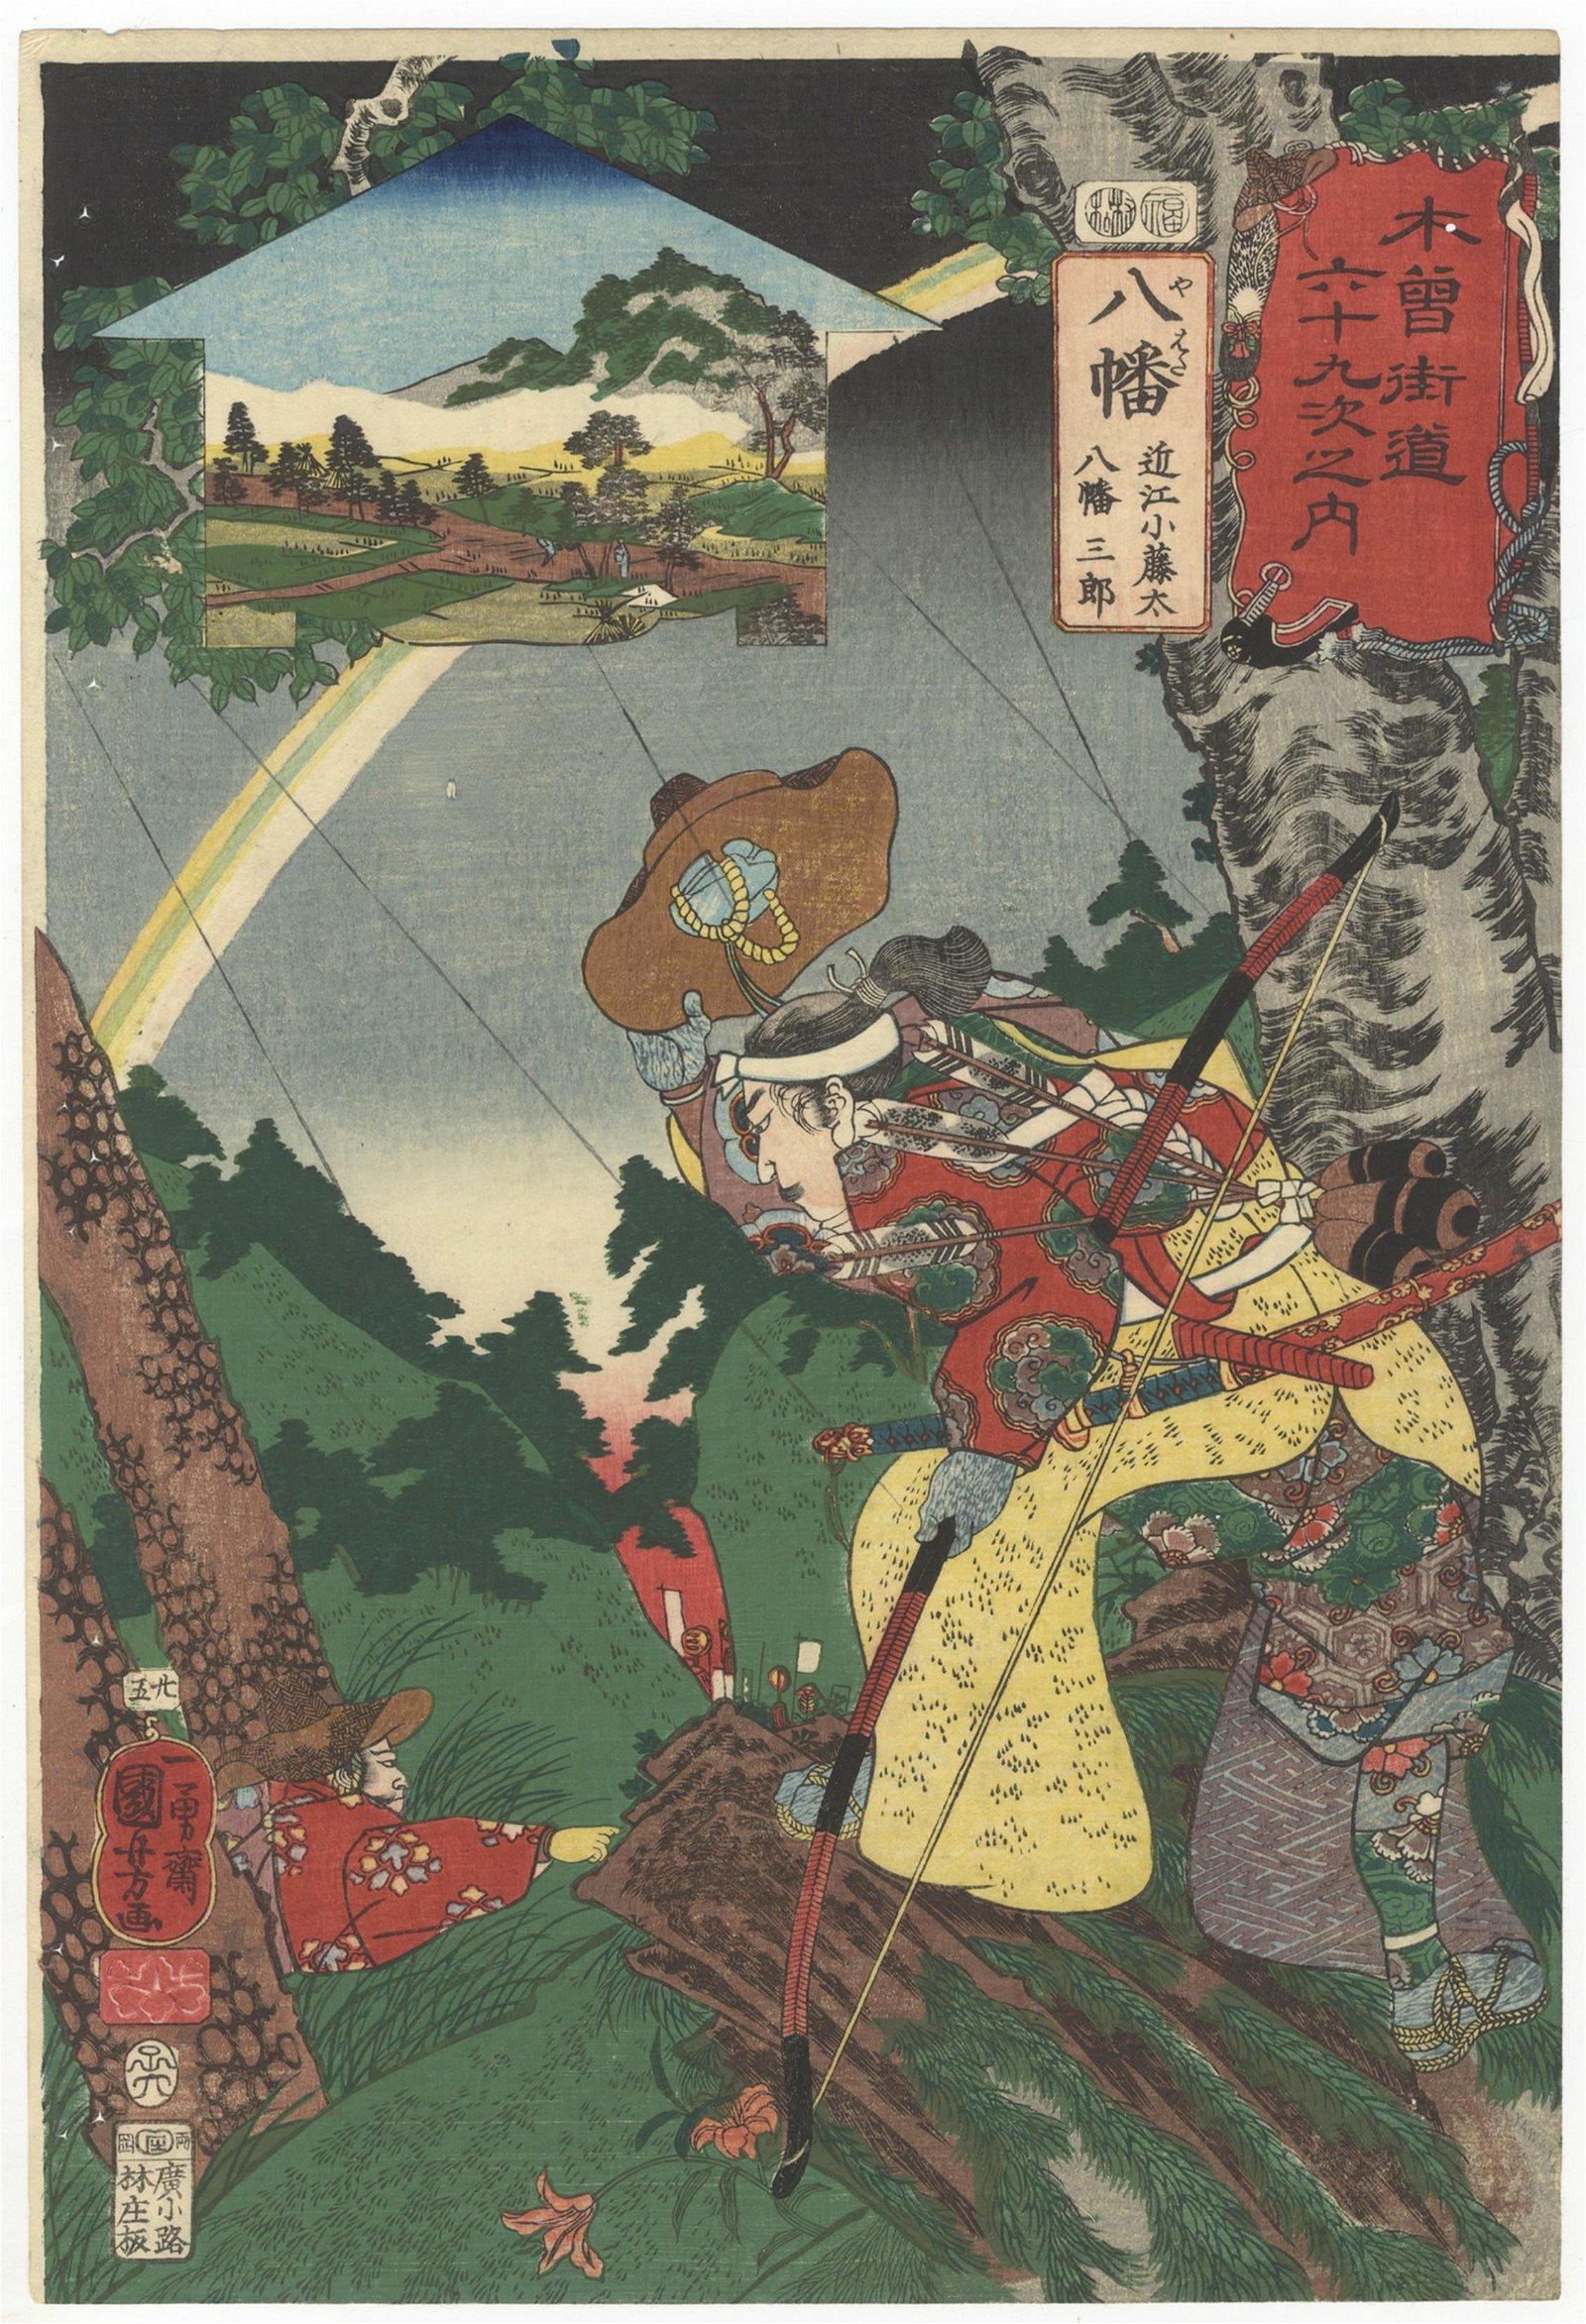 Kuniyoshi Utagawa, Warrior Print, Kisokaido, Rainbow,